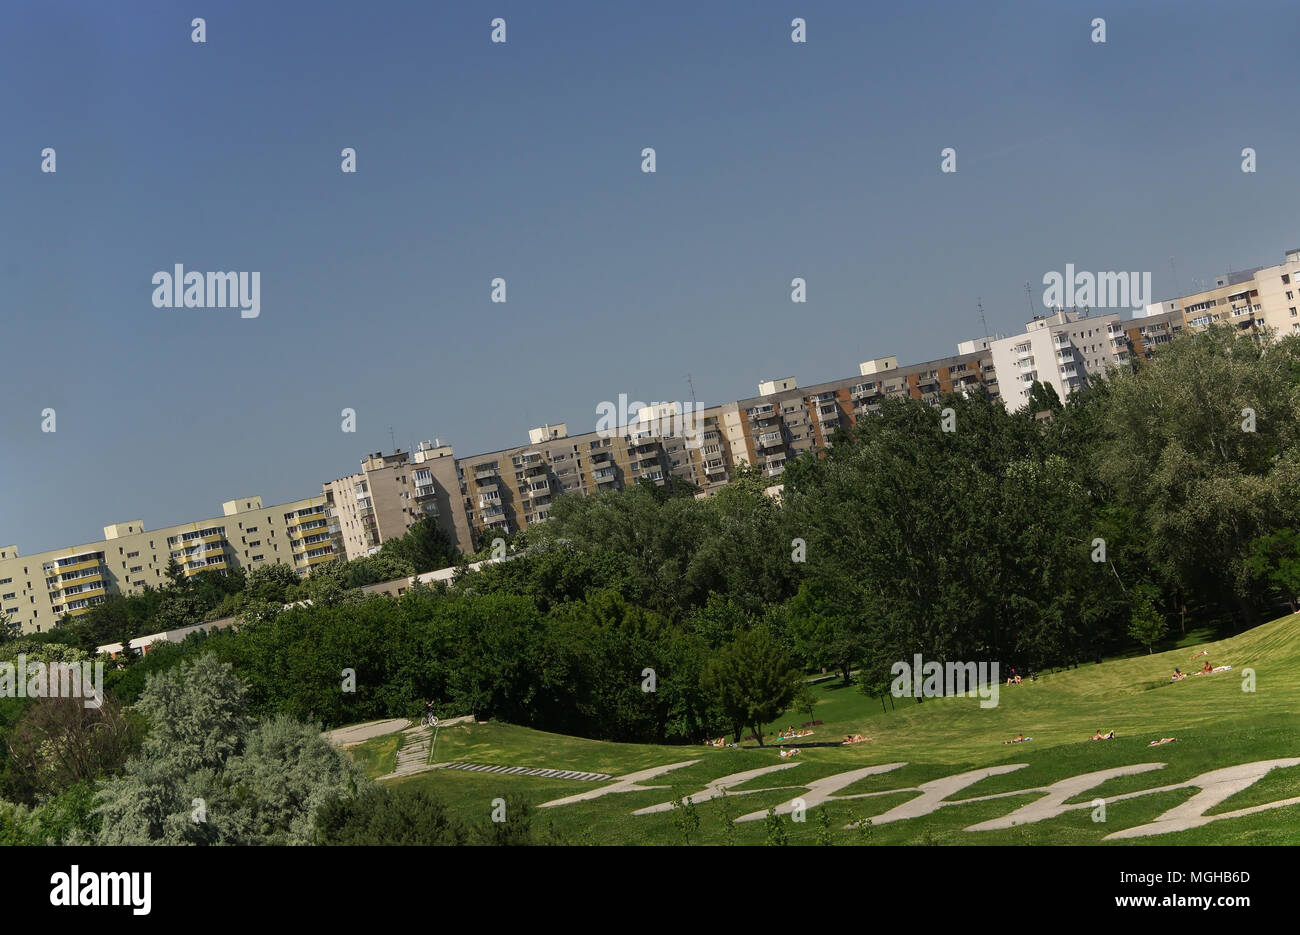 BUCHAREST,ROMANIA,JUNE 7,2015:dutch angle on Titan Park with distant people sunbathing on grass, apartments buildings skyline Stock Photo